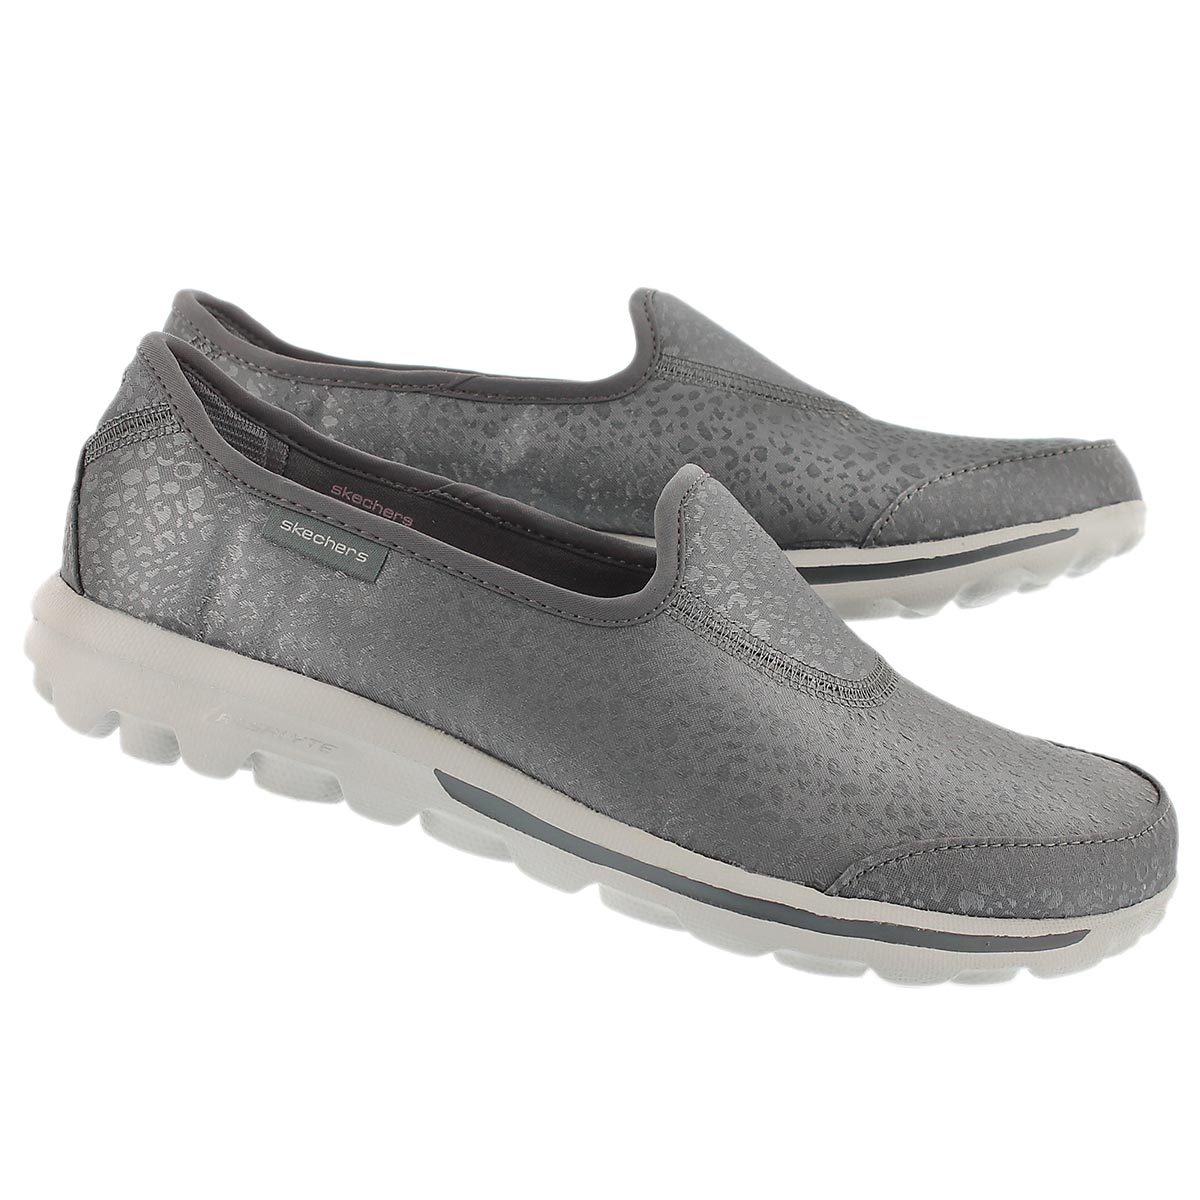 Lds GOwalk- Untamed char slip on